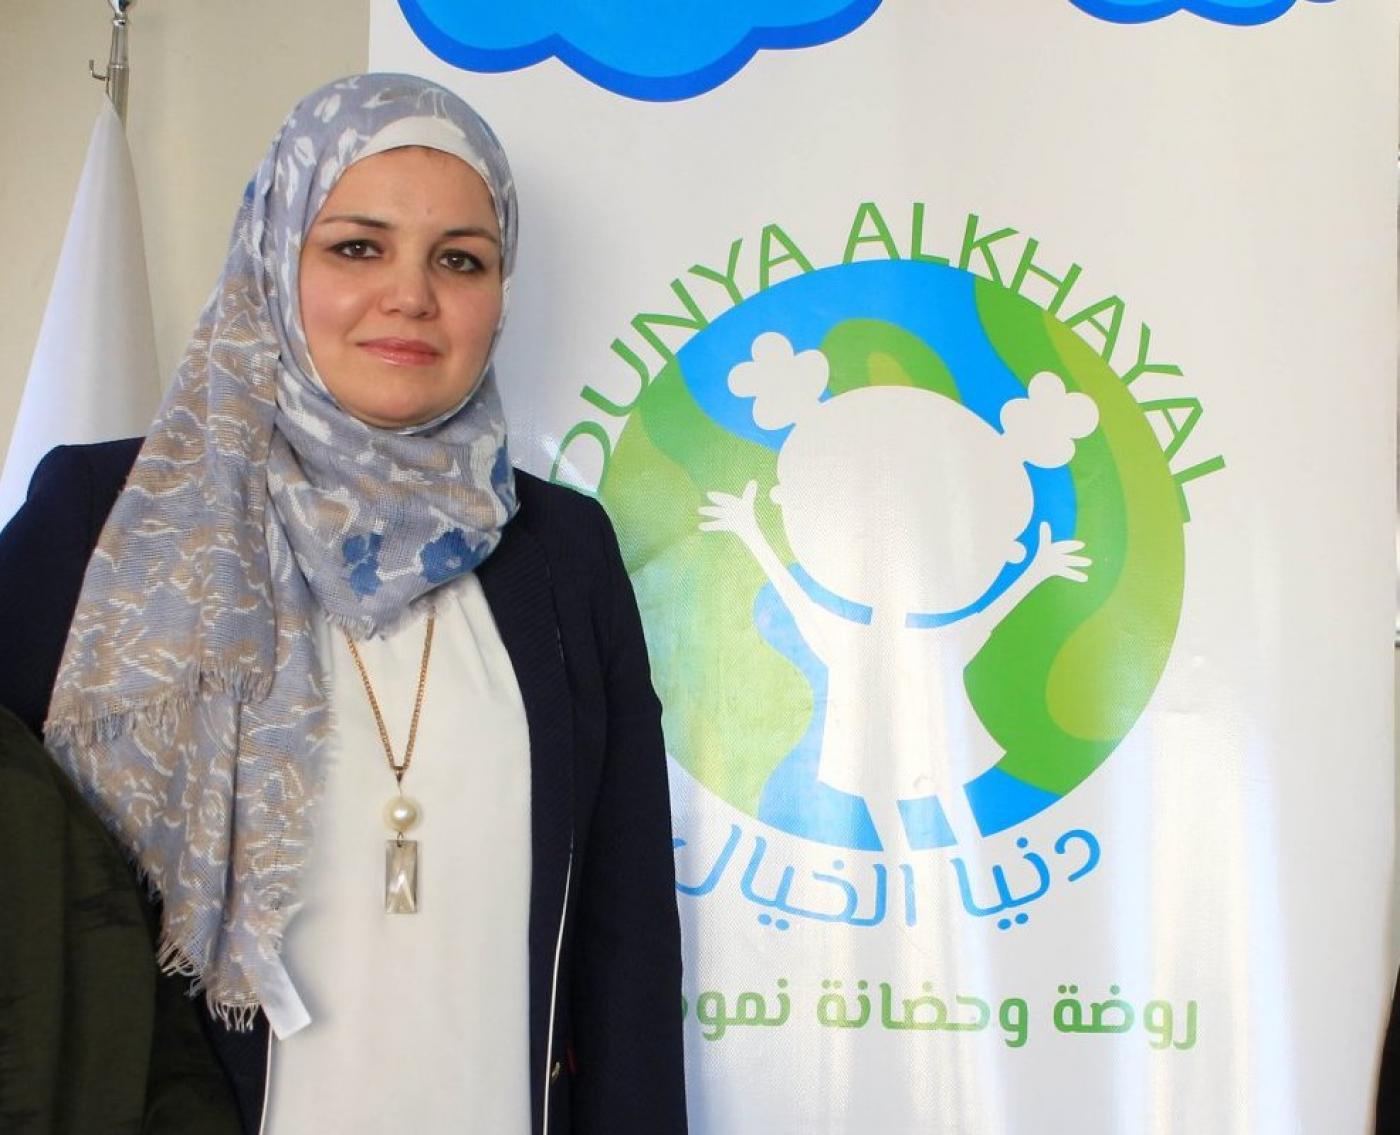 Dania Abdulbaqi is the founder of the daycare centre Dunya al-Khayal, Arabic for 'Wonder World', in Gaziantep, Turkey (Dania Abdulbaqi)